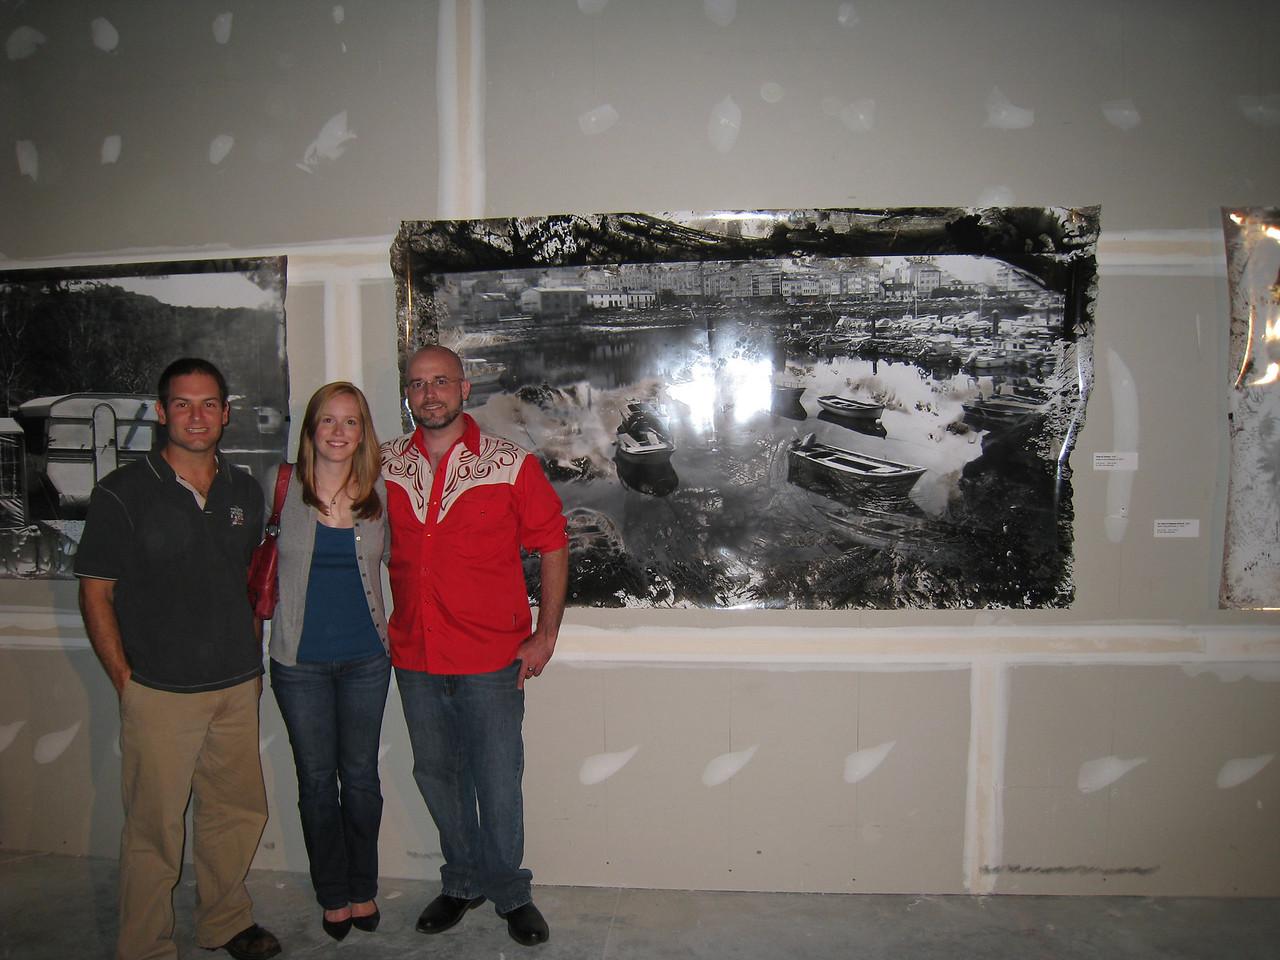 10/2/2009 - Jon Deutsch, Lauren Tipton, Shaun Irvining in front of Shaun's art at an exhibit.